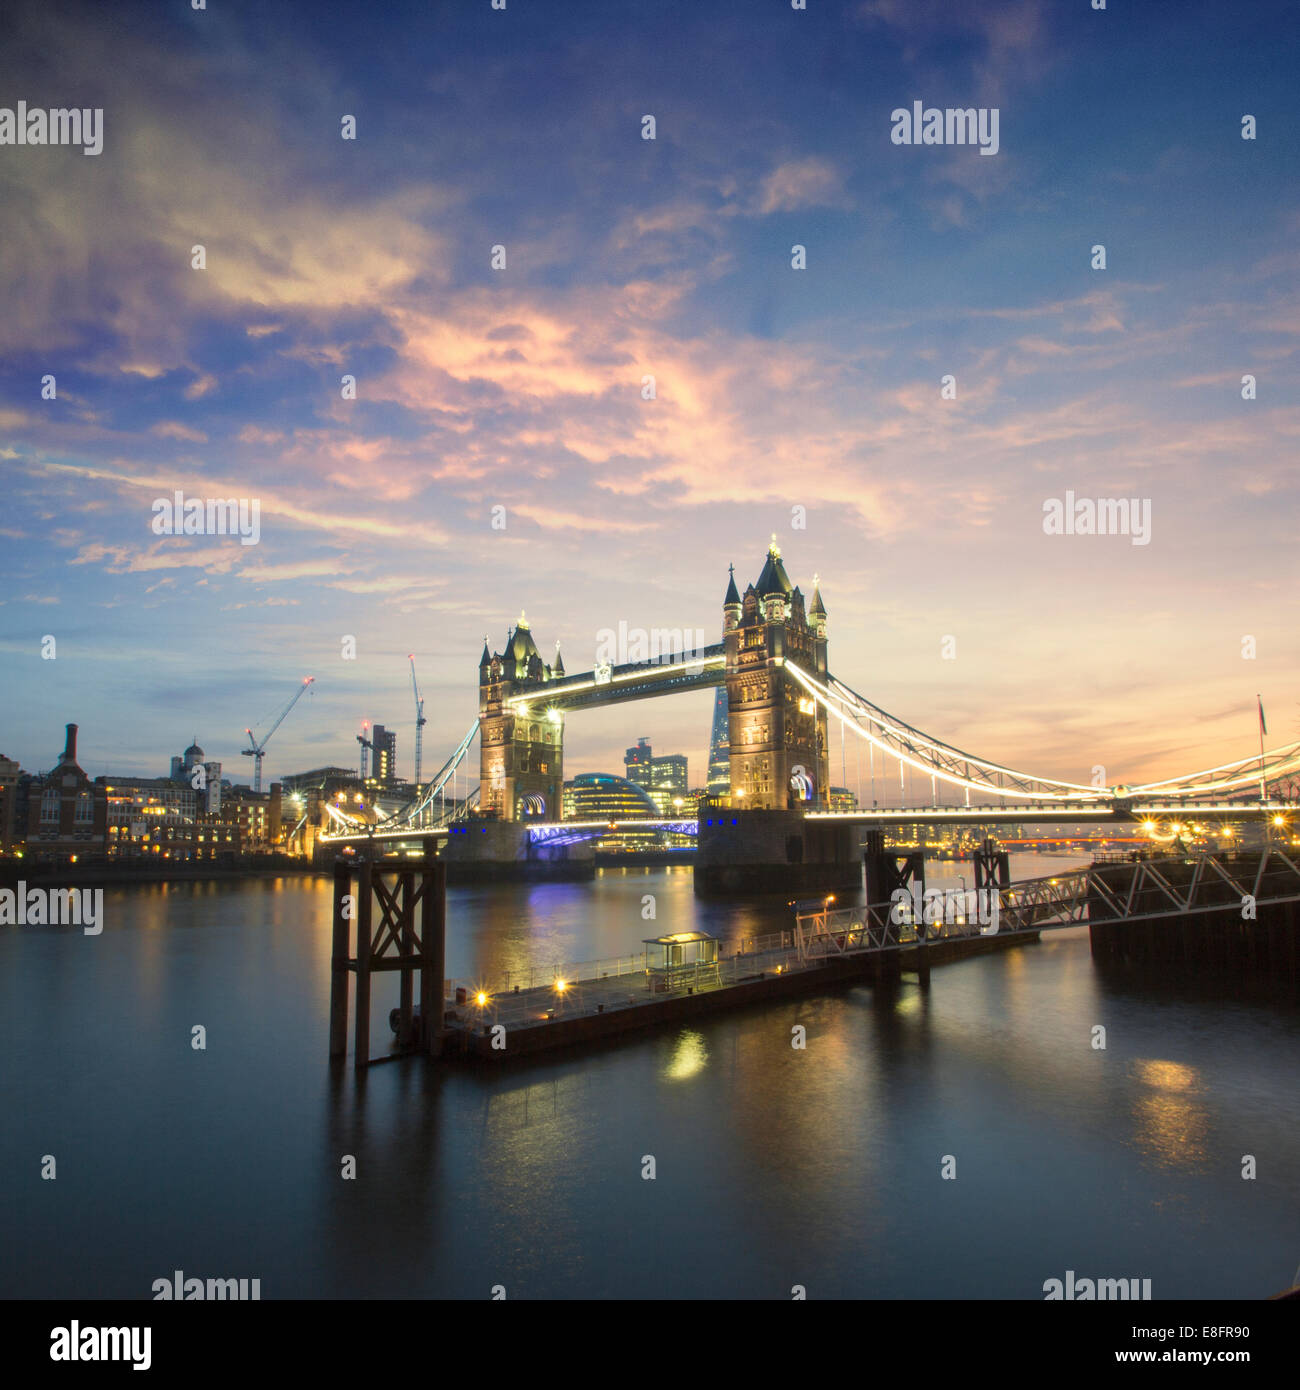 United Kingdom, London, Tower Bridge at night - Stock Image